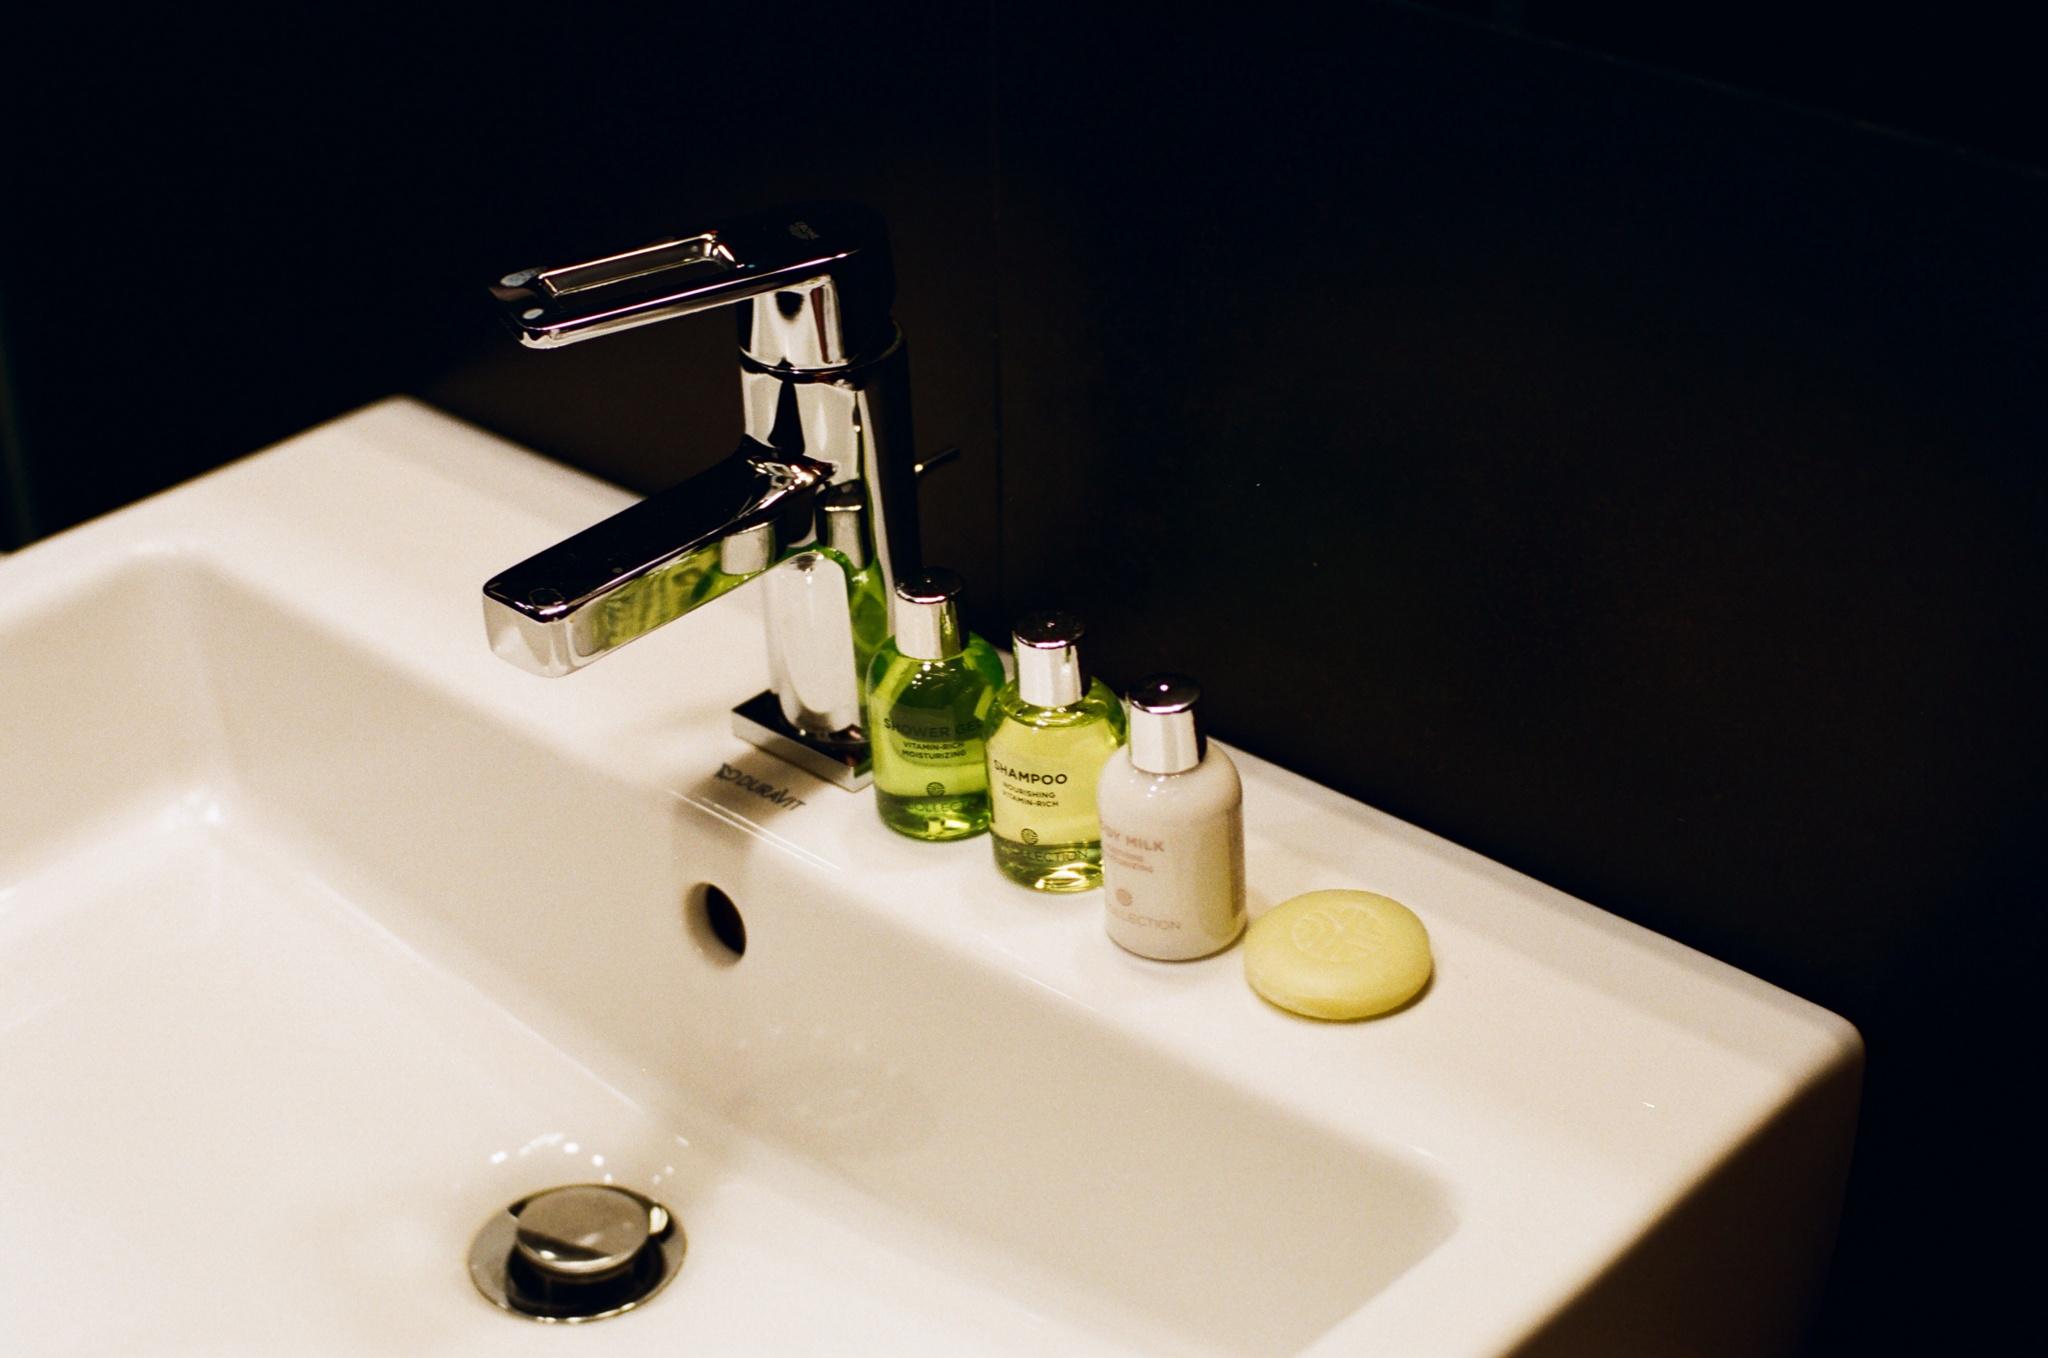 Toilet schick by Vadim Becker